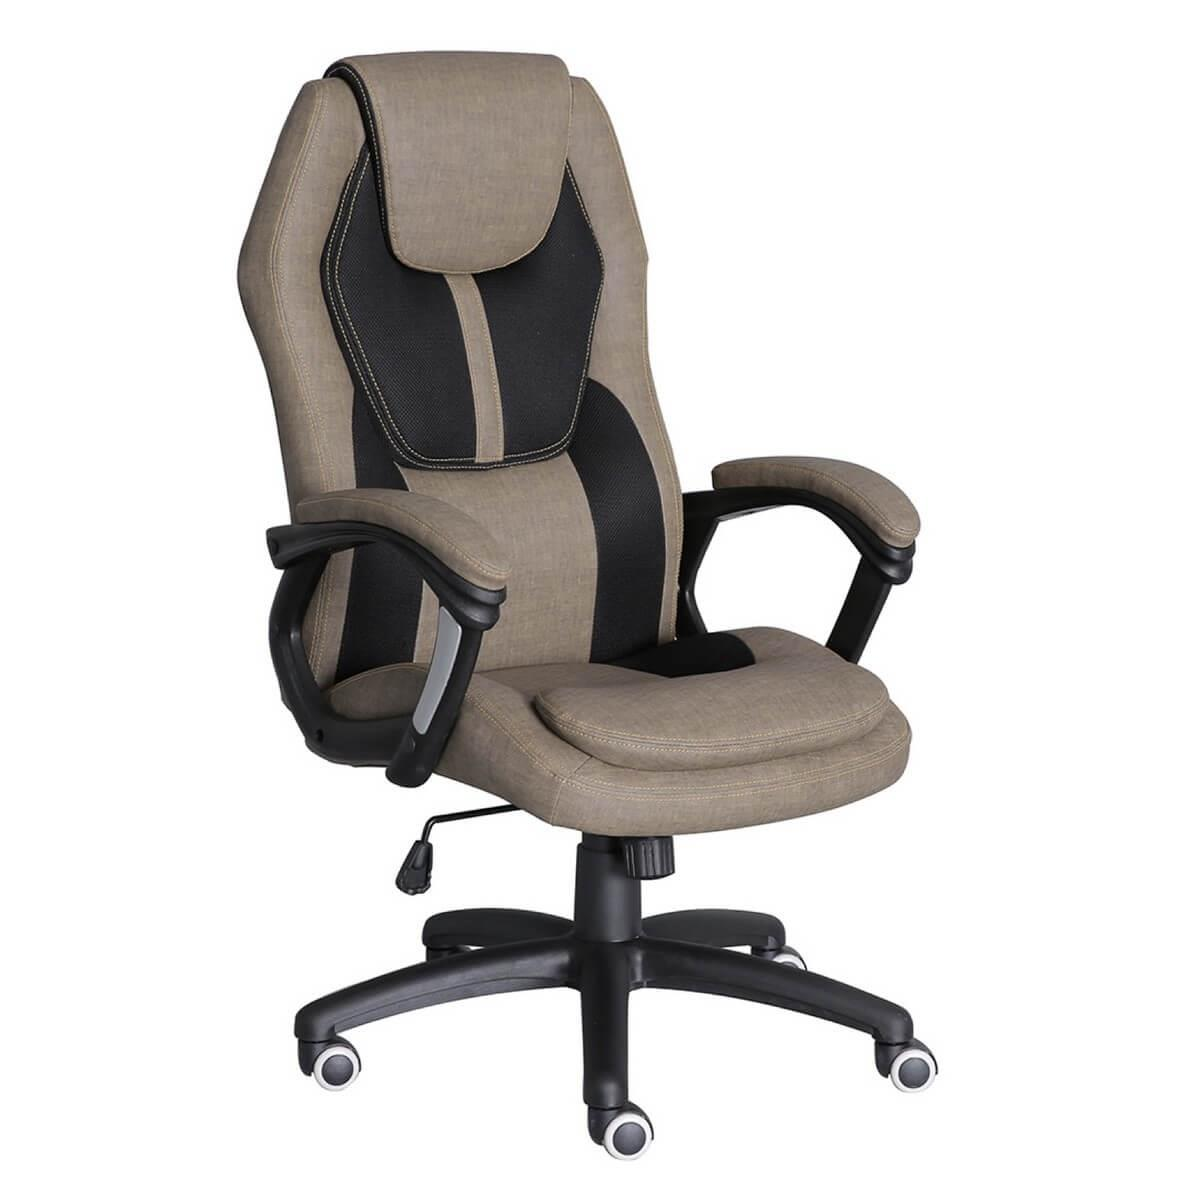 Office Desk Chair Executive Adjustable Swivel Seat High Back Headrest Grey